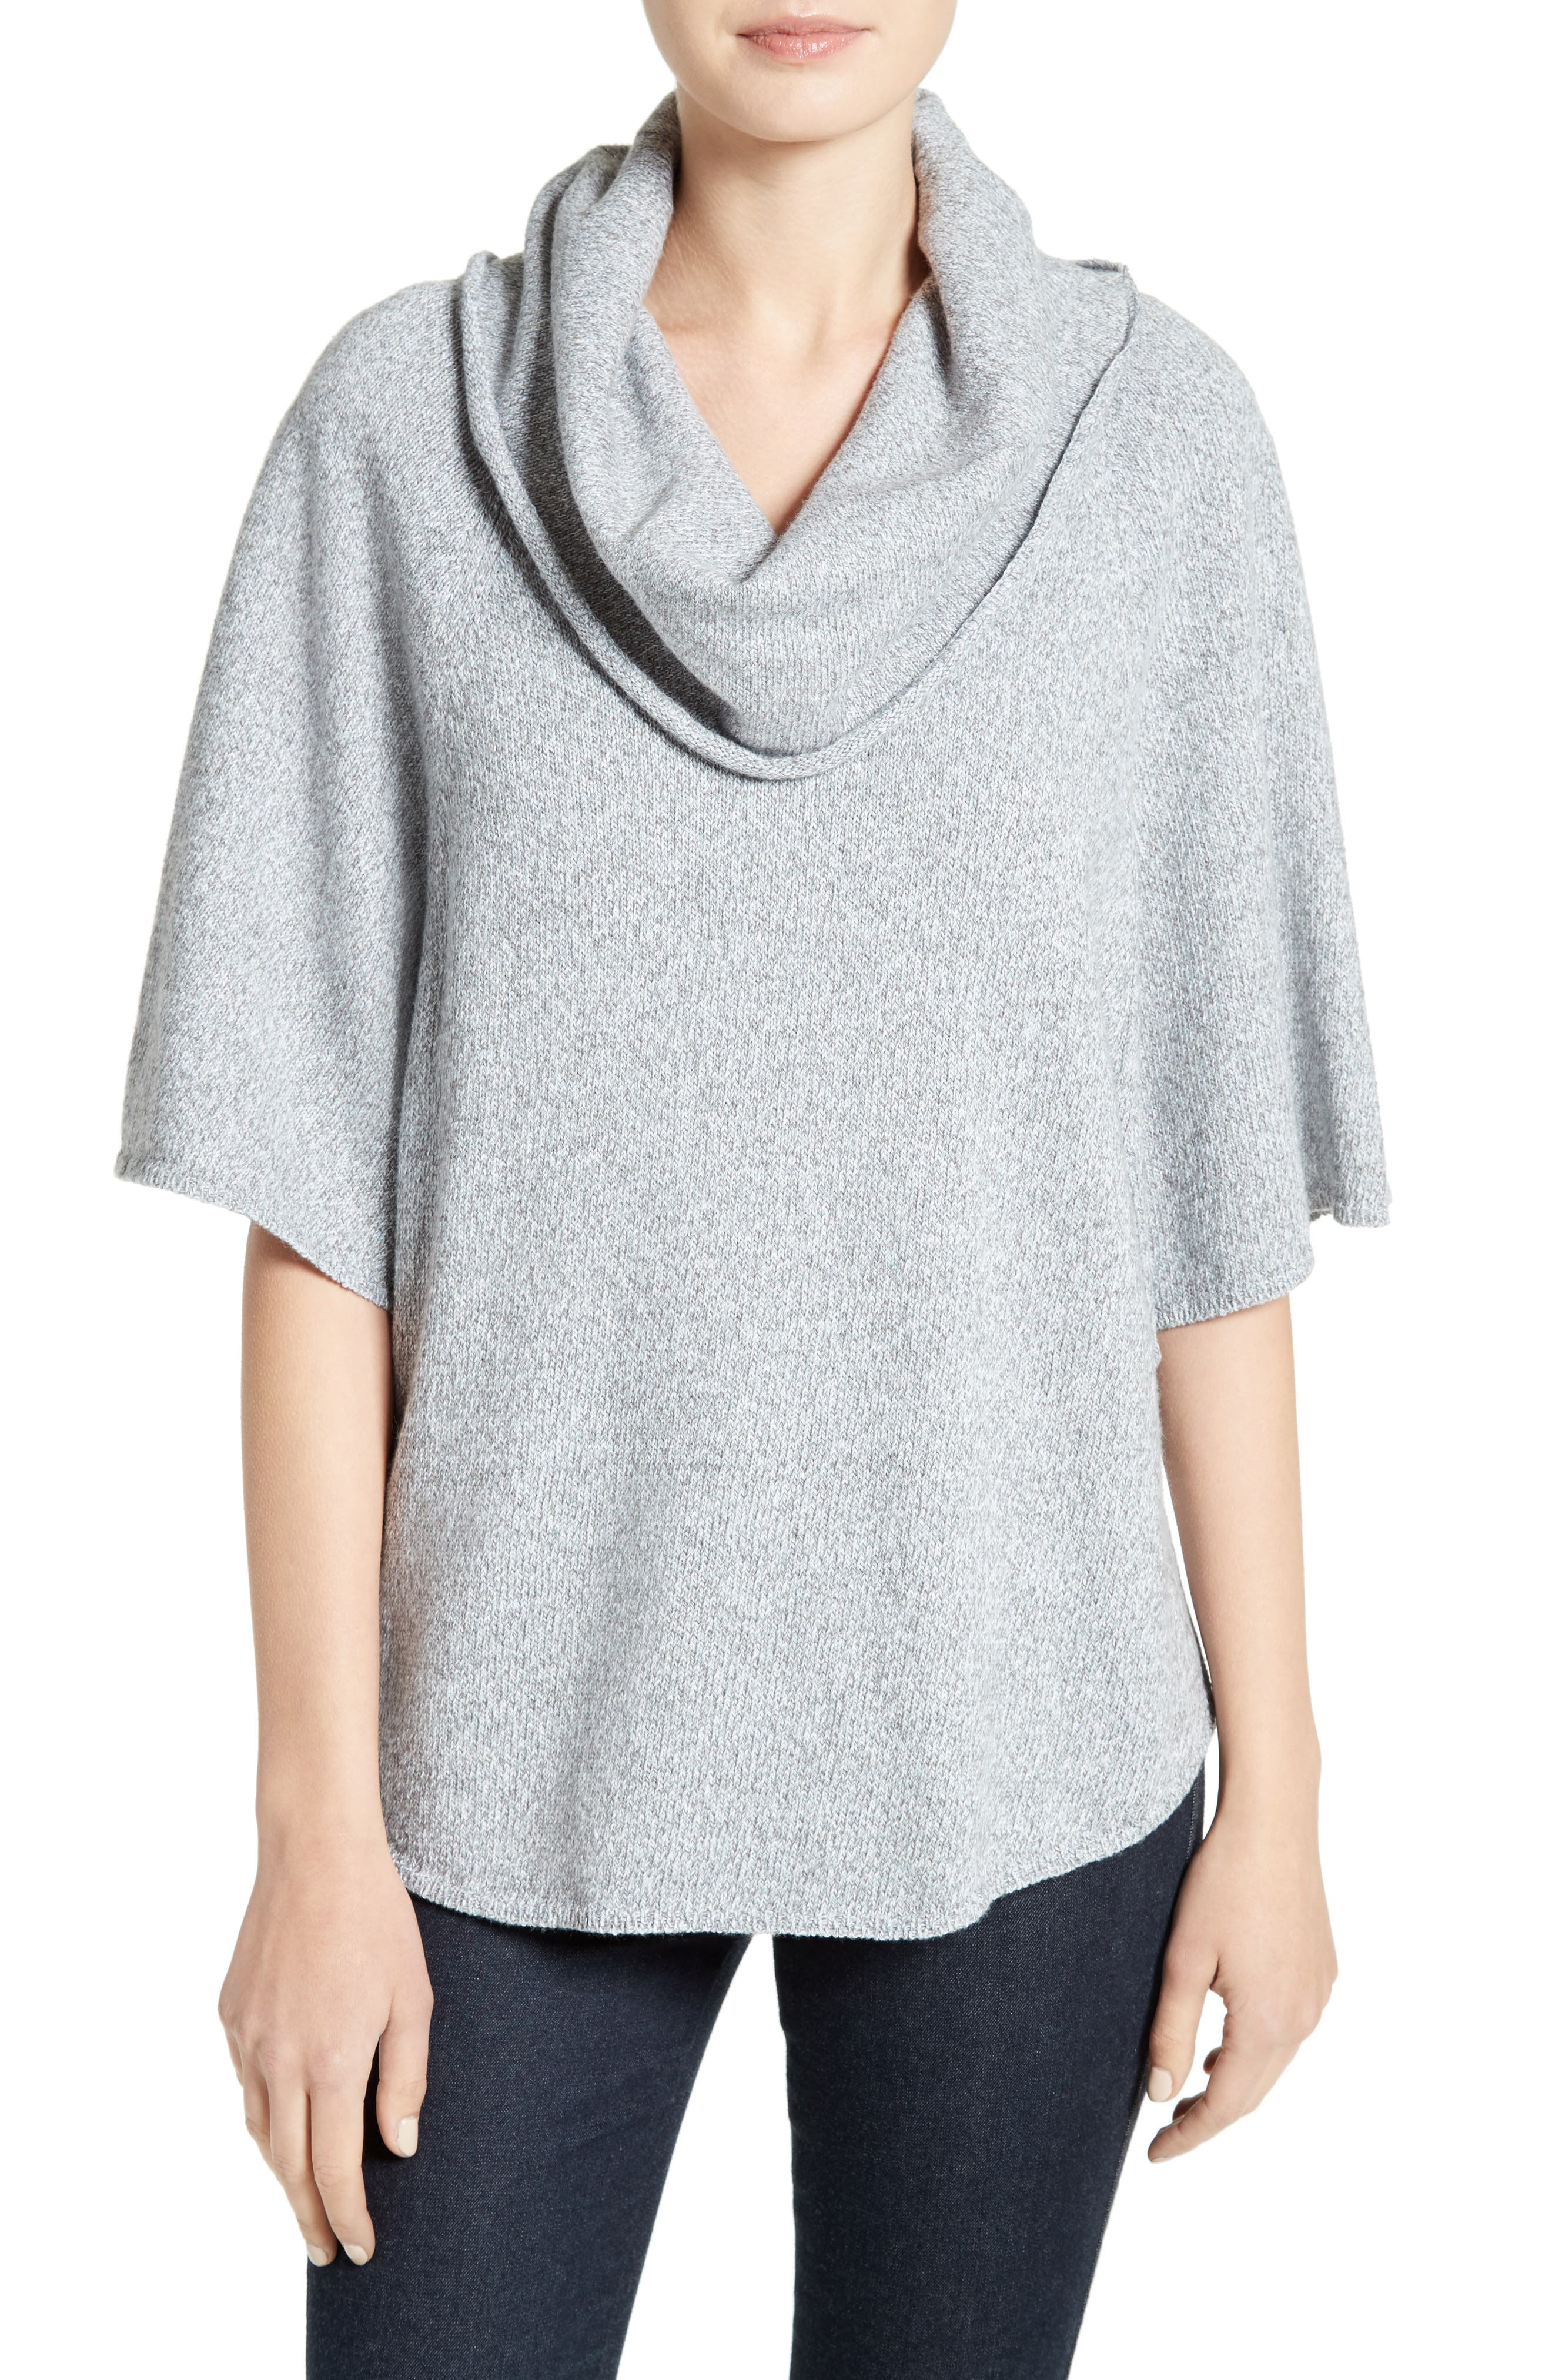 Celia Cowl Neck Sweater,                             Main thumbnail 1, color,                             059